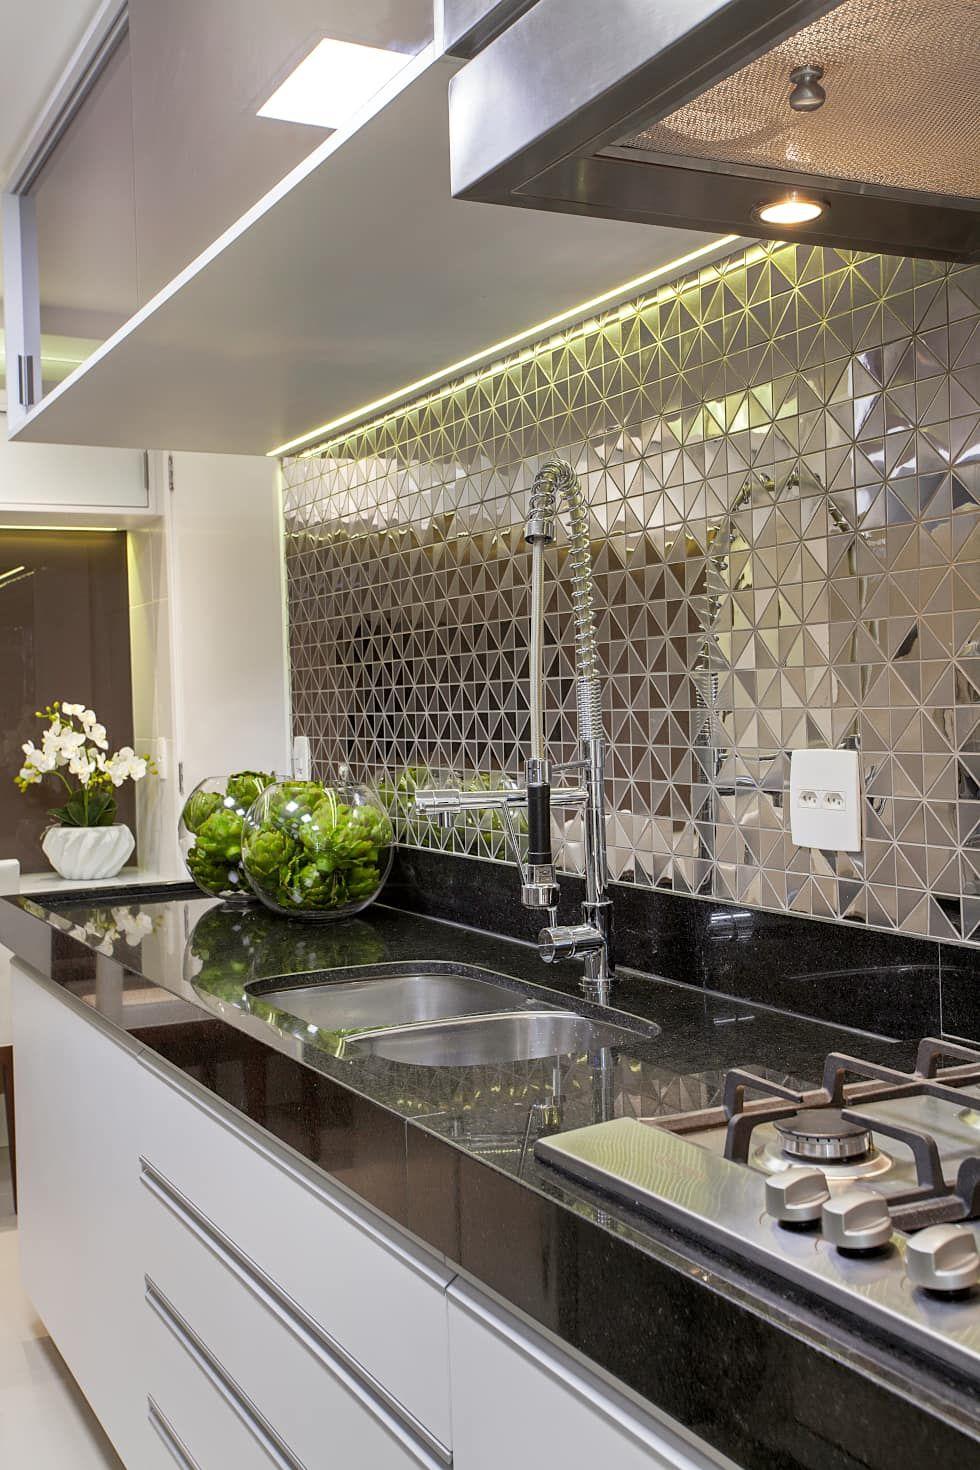 Fotos de decora o design de interiores e reformas - Paredes modernas para interiores ...